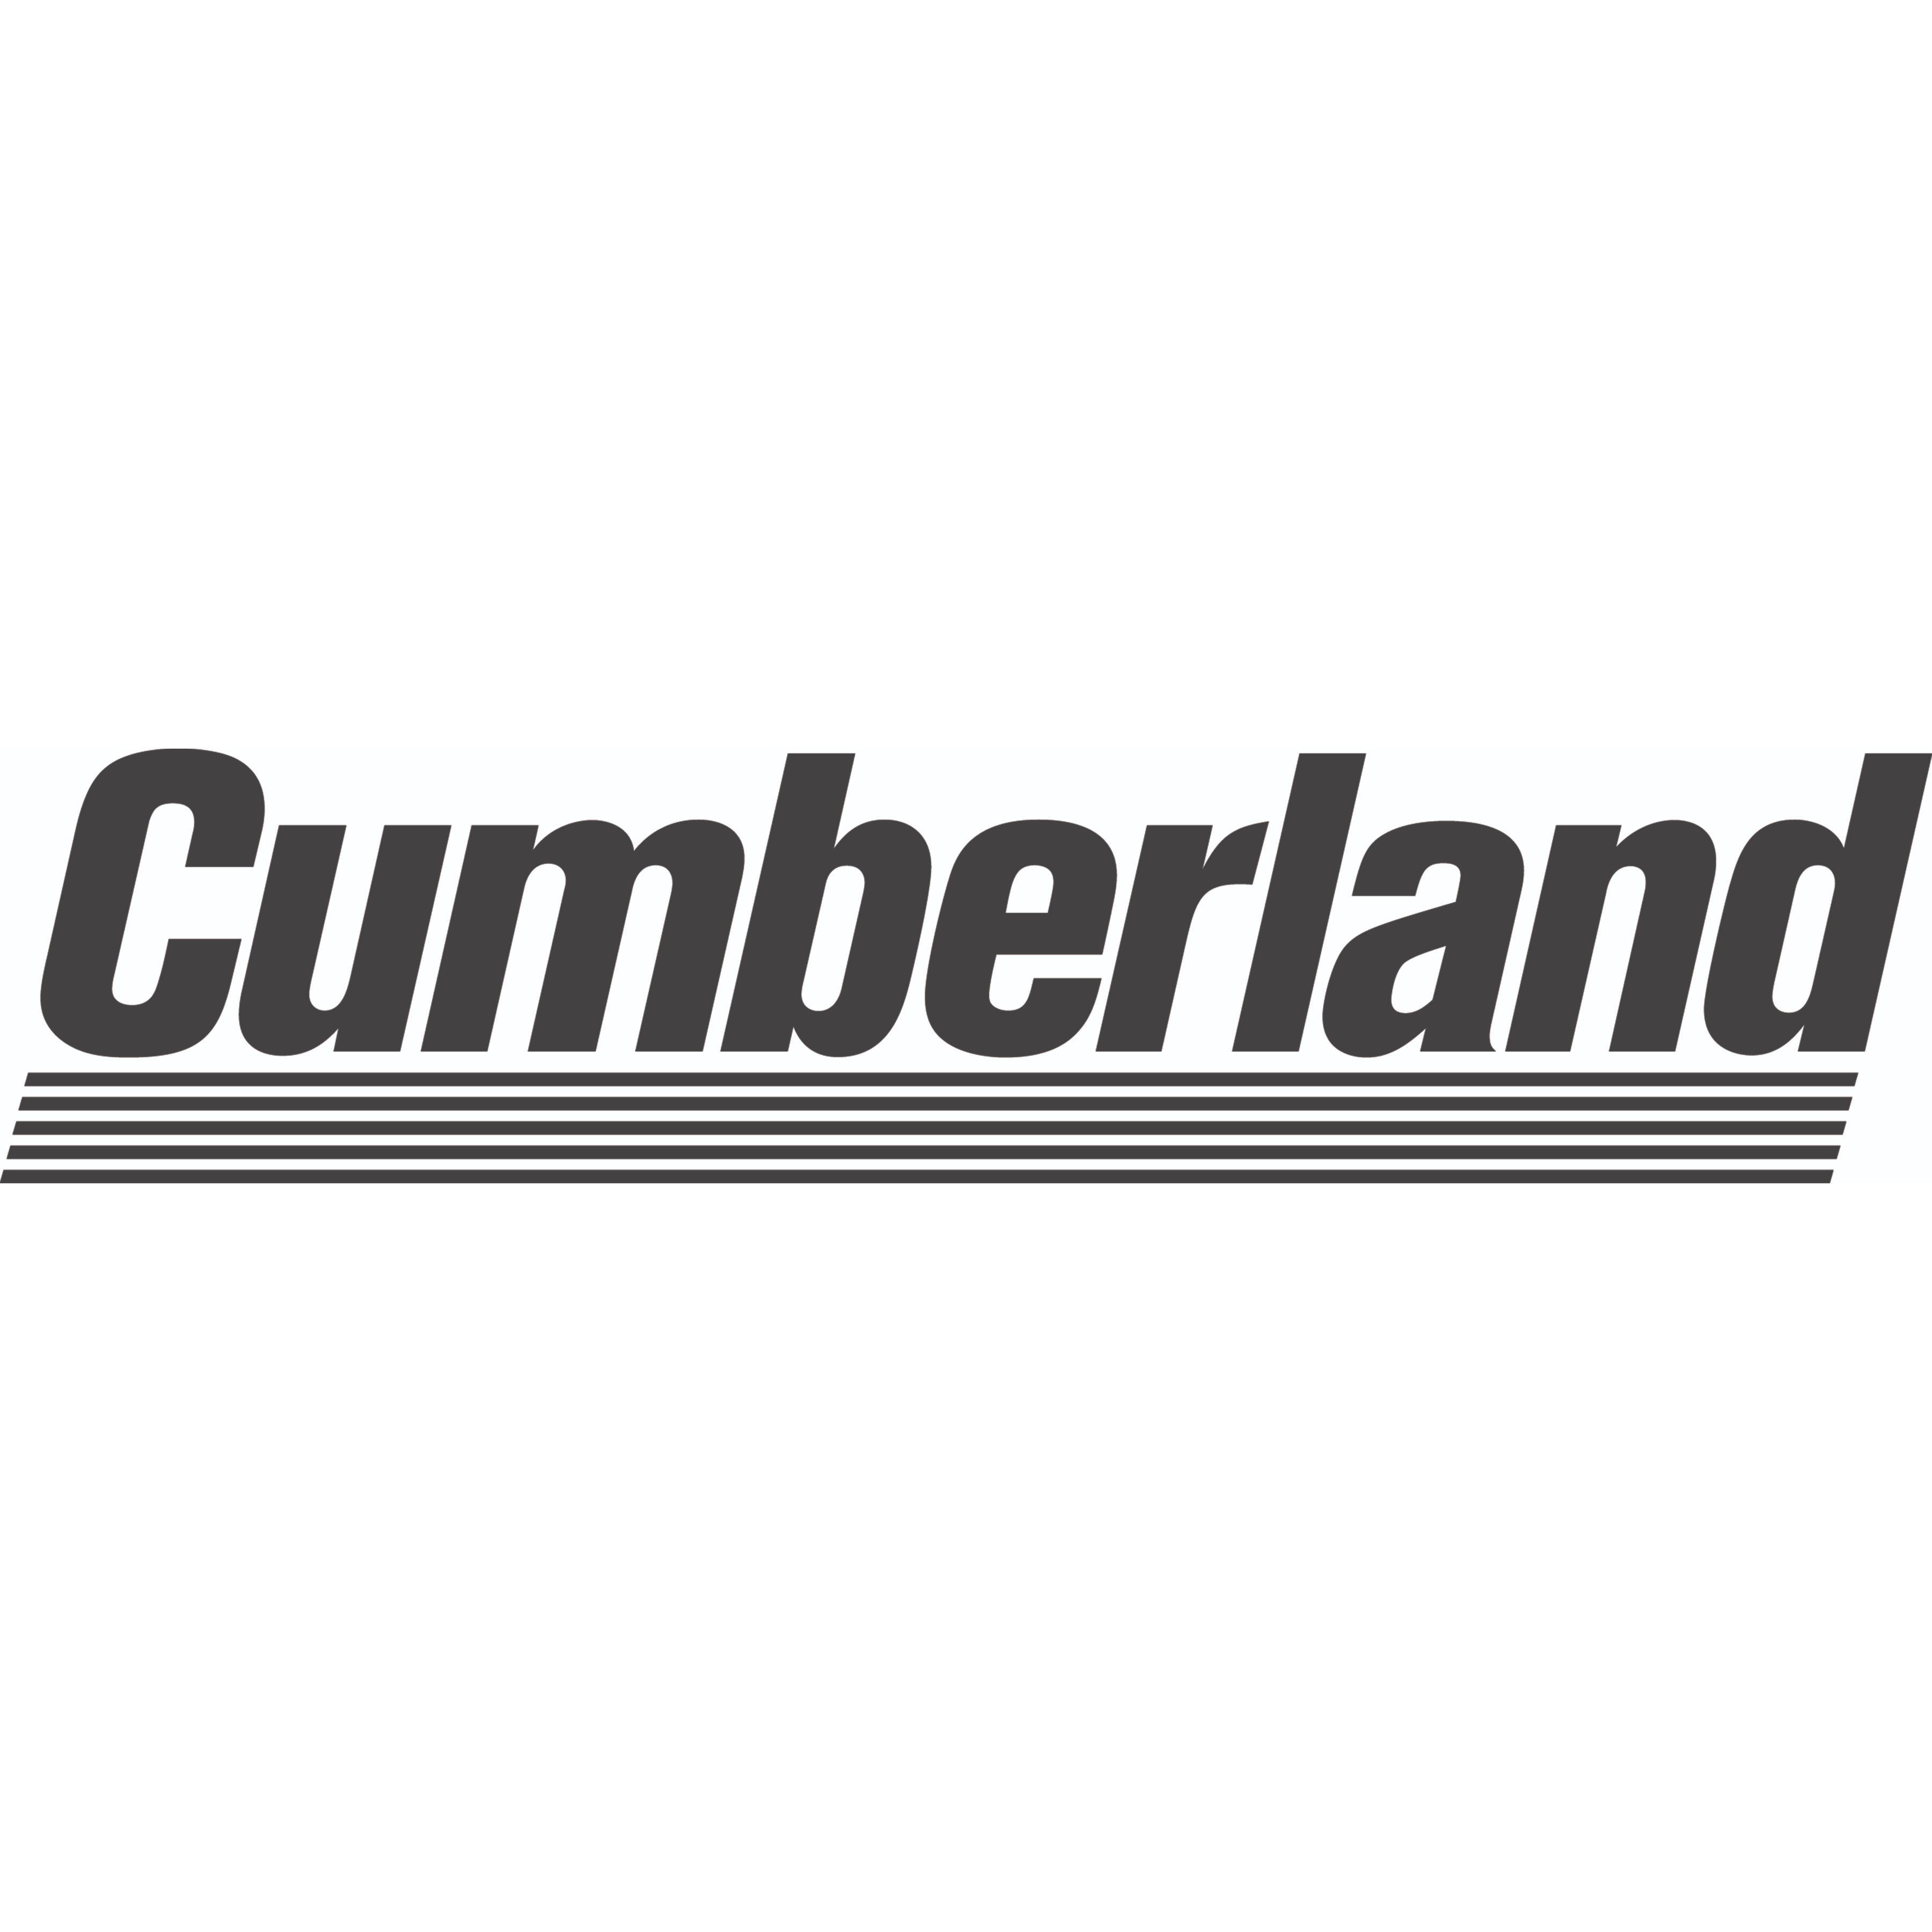 Cumberland Companies / Corporate Headquarters